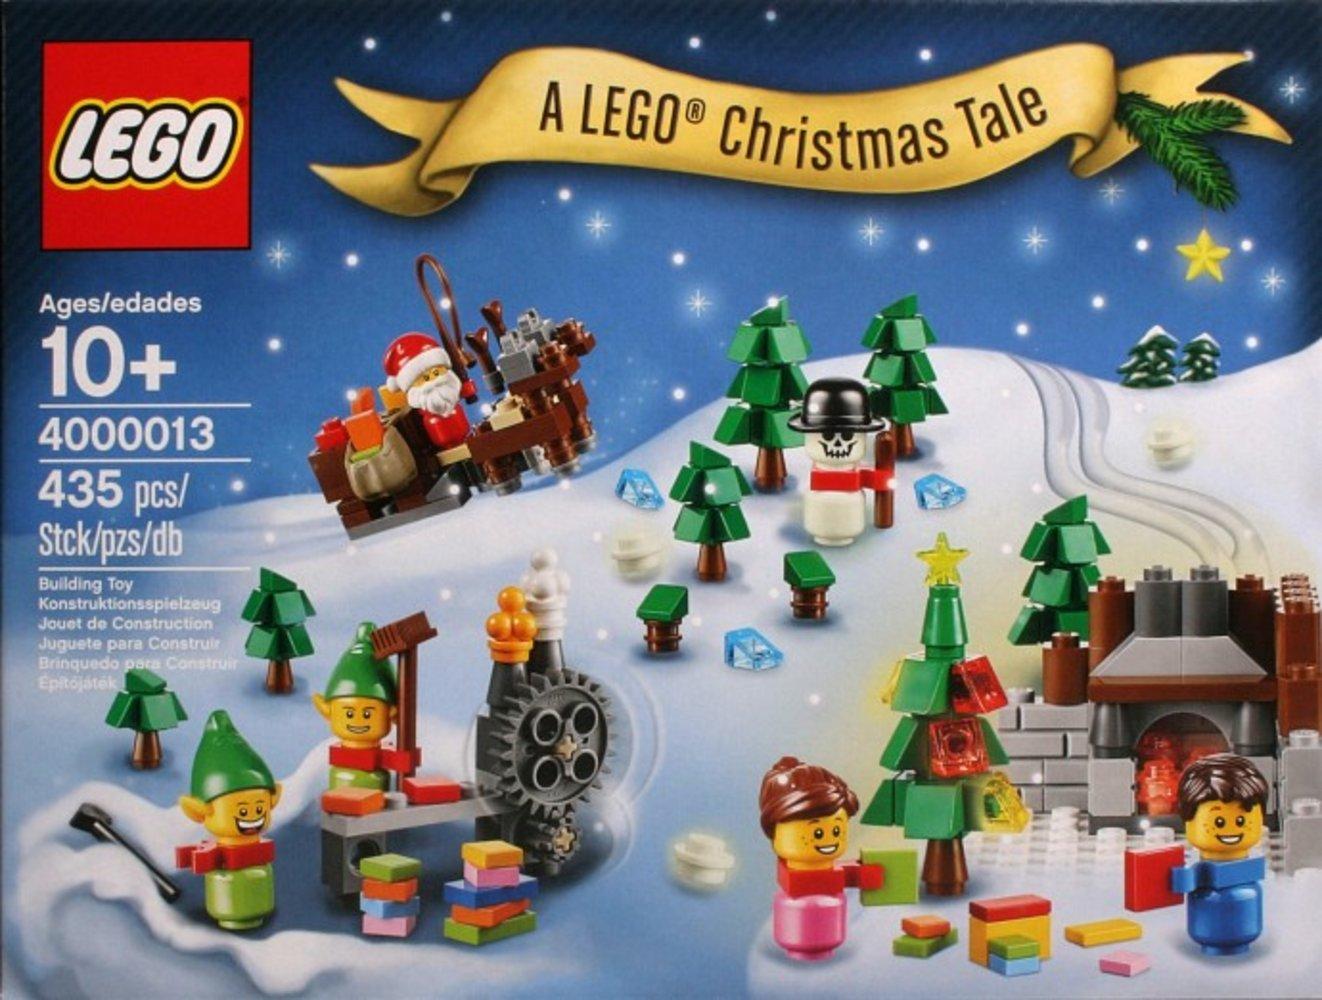 A LEGO Christmas Tale